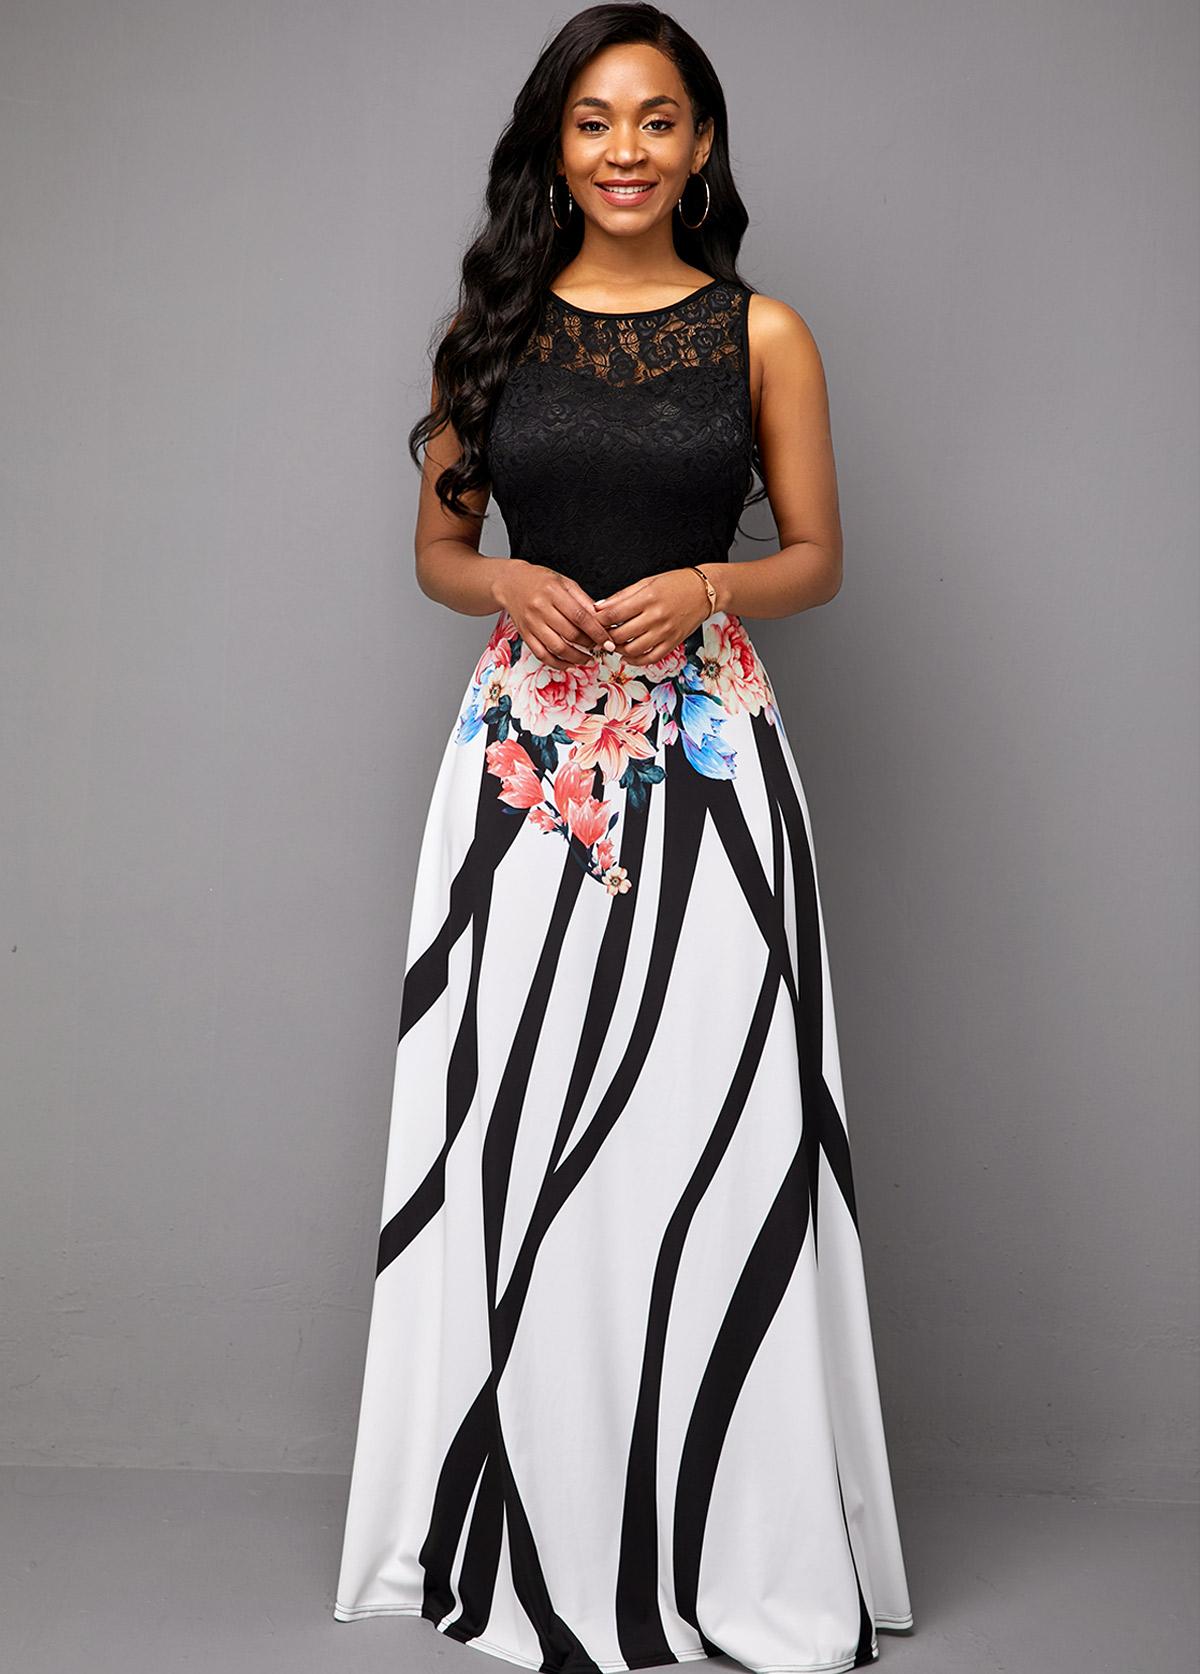 Lace Patchwork Sleeveless Flower Print Maxi Dress